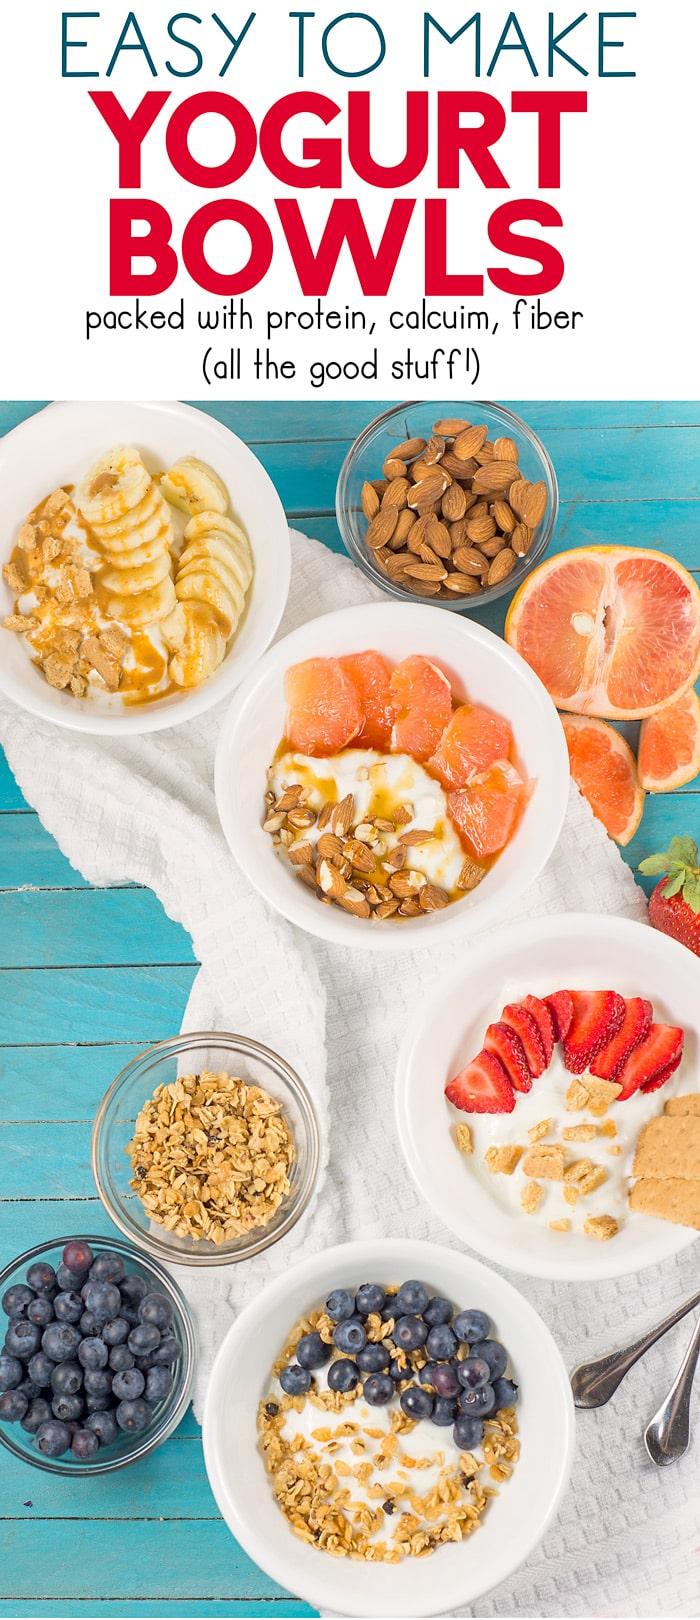 Yogurt bowl ideas